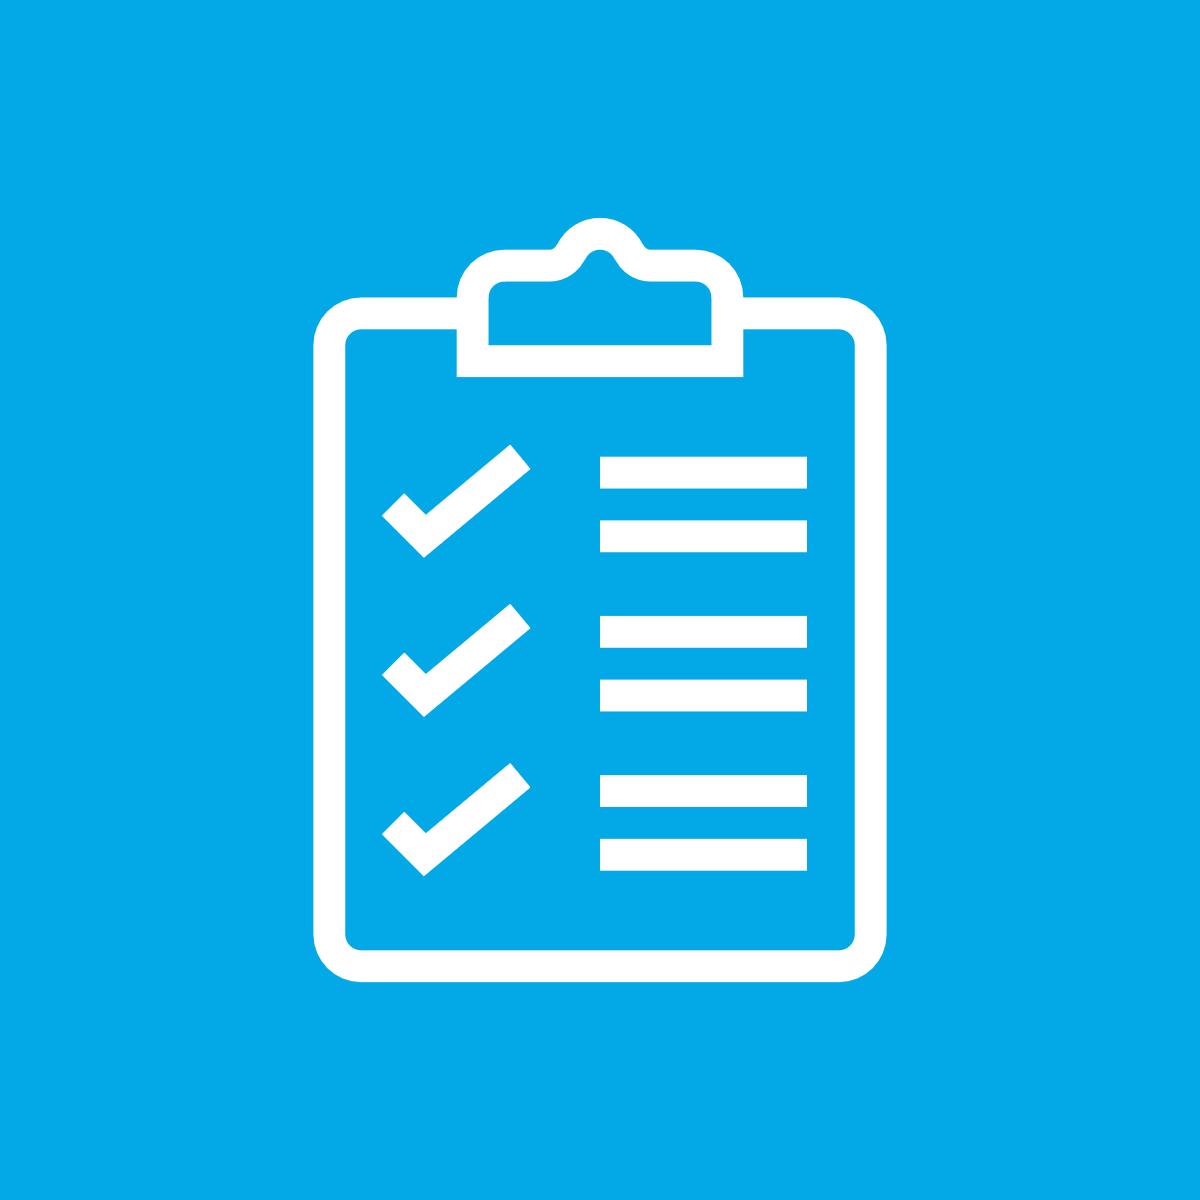 Icon für Checkliste